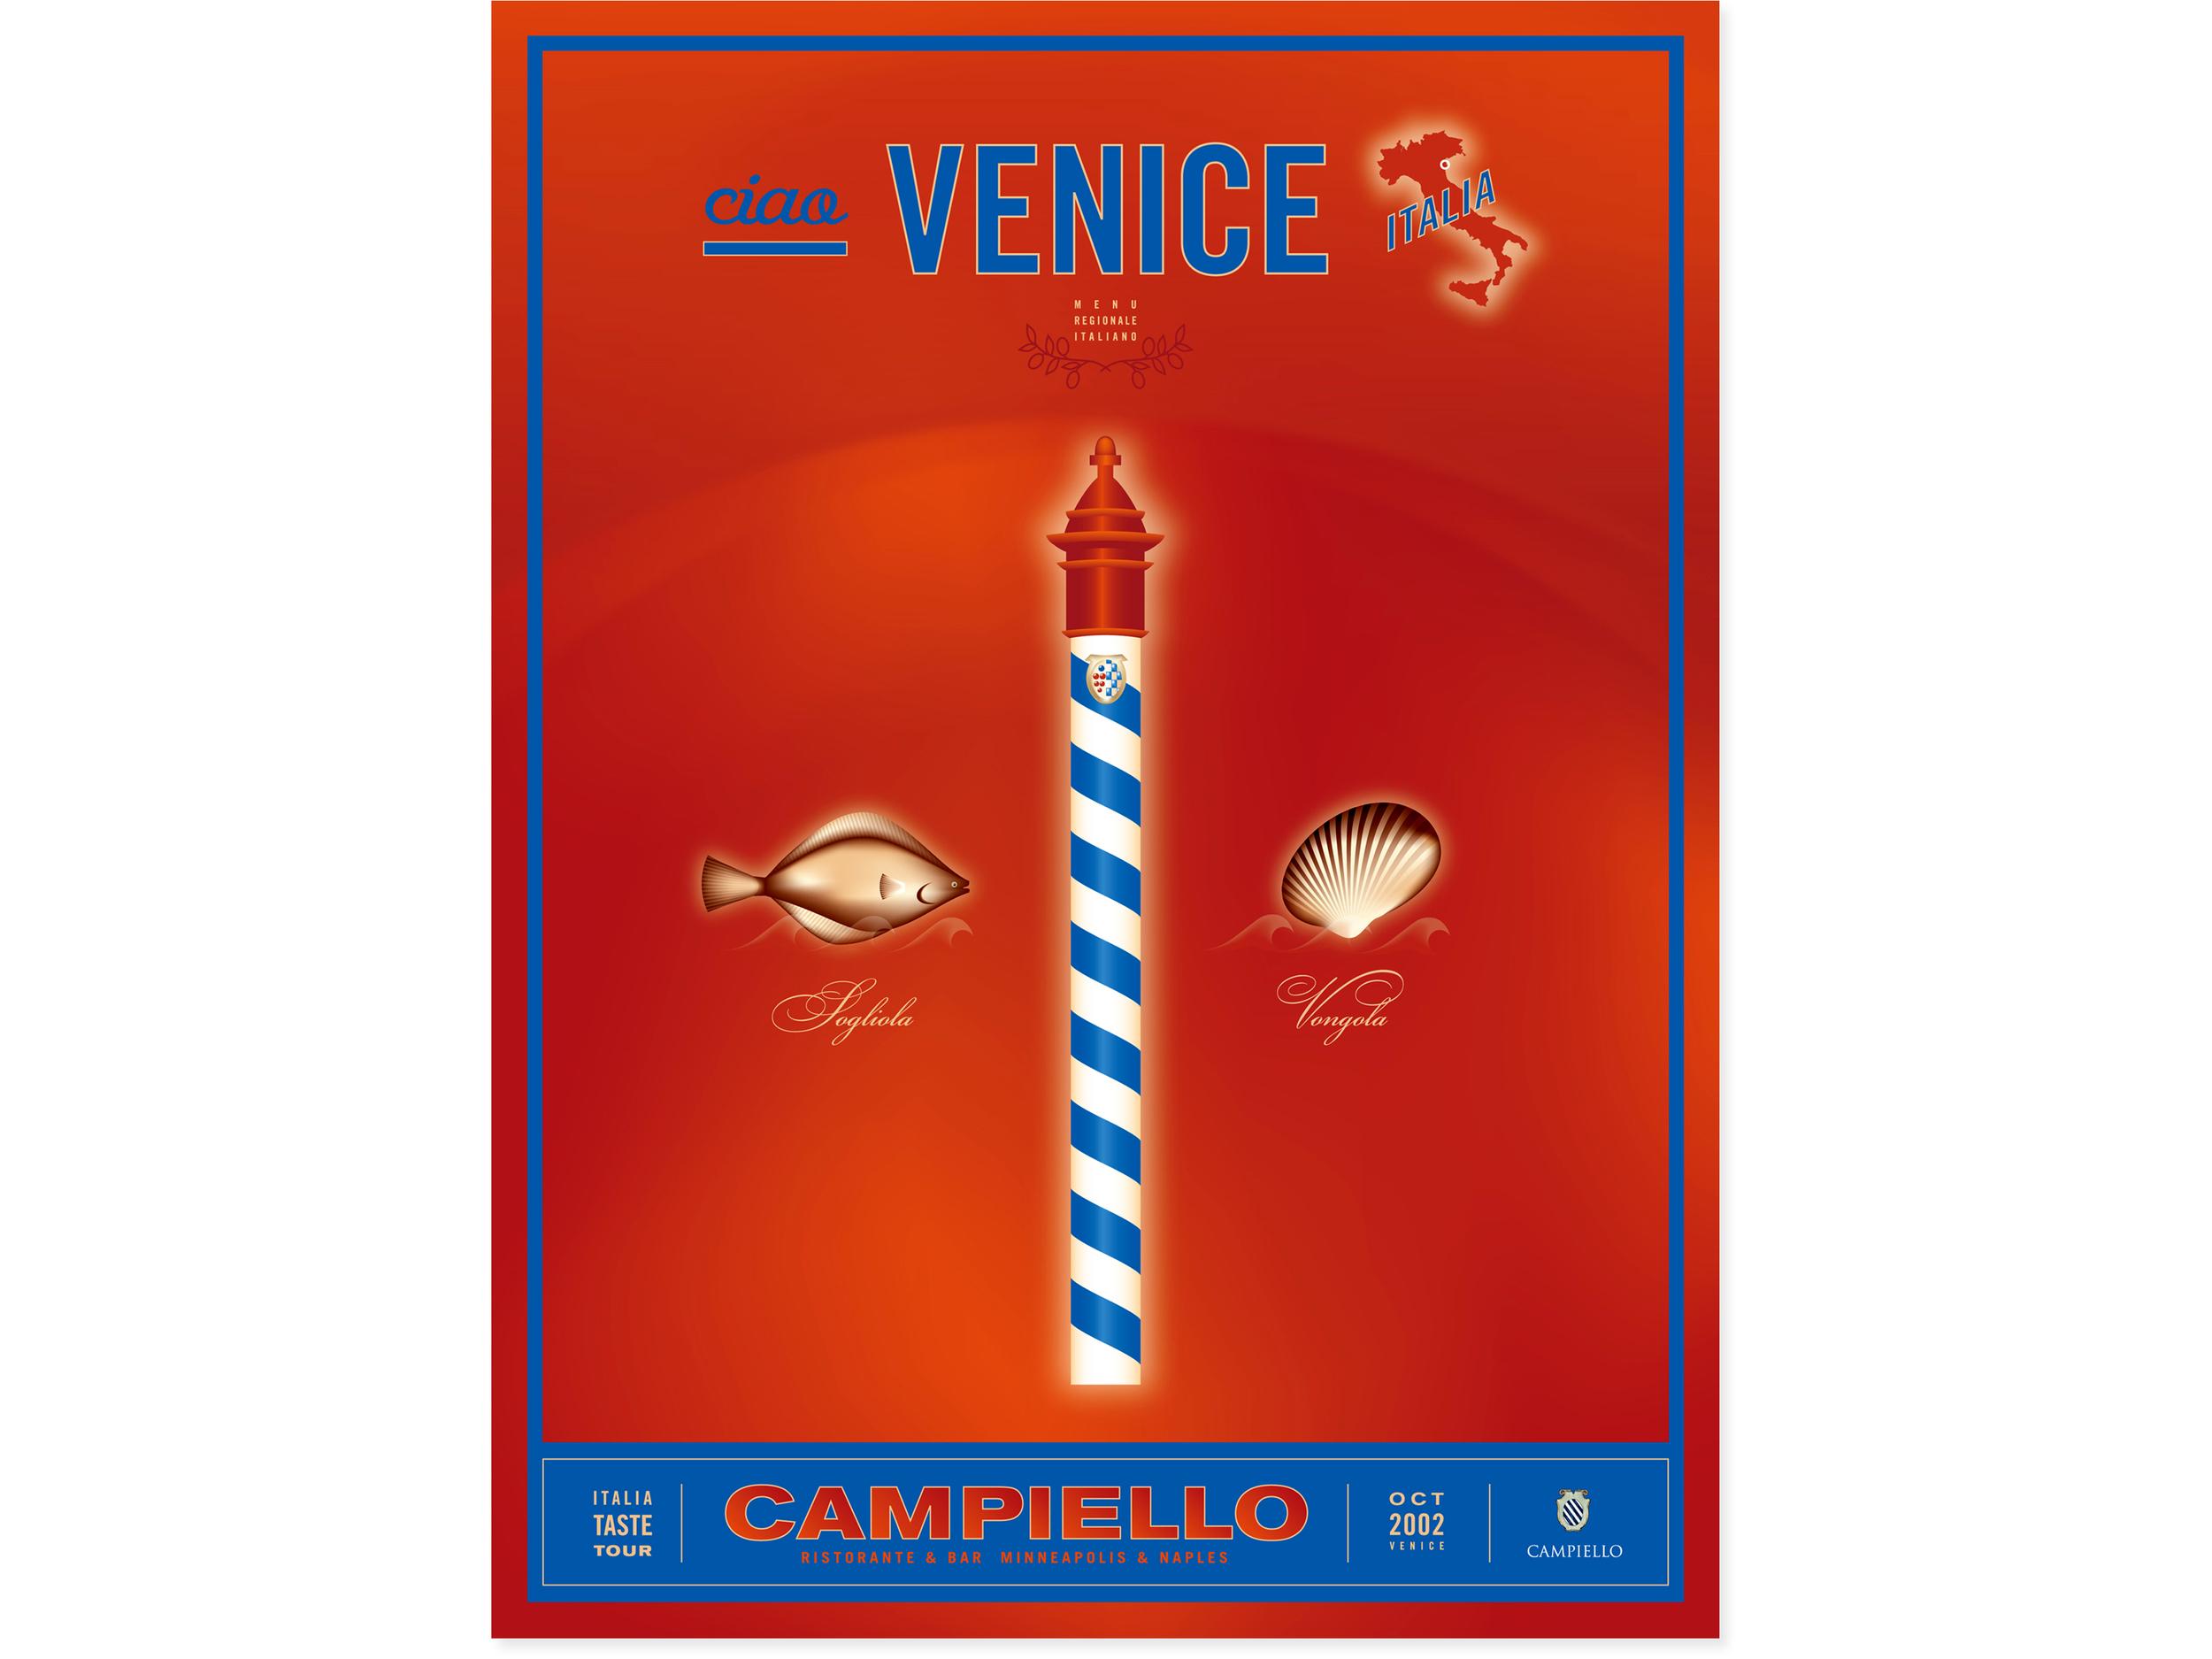 CAM_venice.jpg